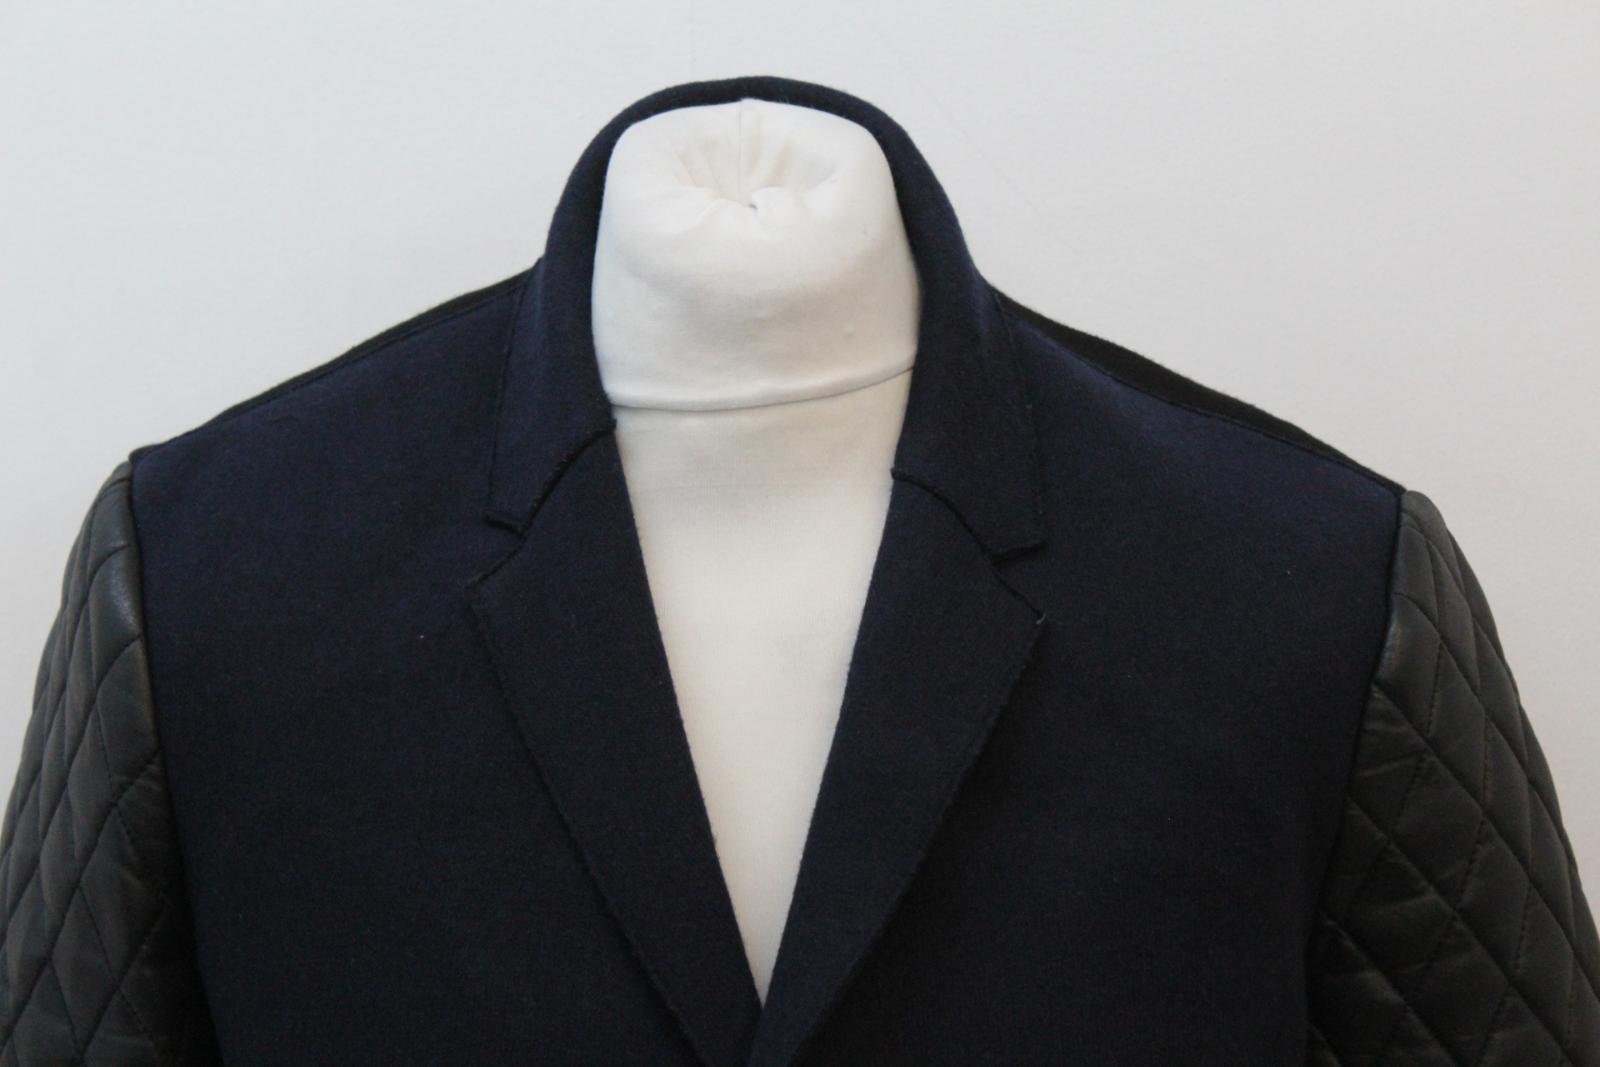 Neil-Barrett-Hombre-Azul-Marino-Imitacion-Cuero-Chaqueta-Blazer-Manga-IT50-UK40 miniatura 3